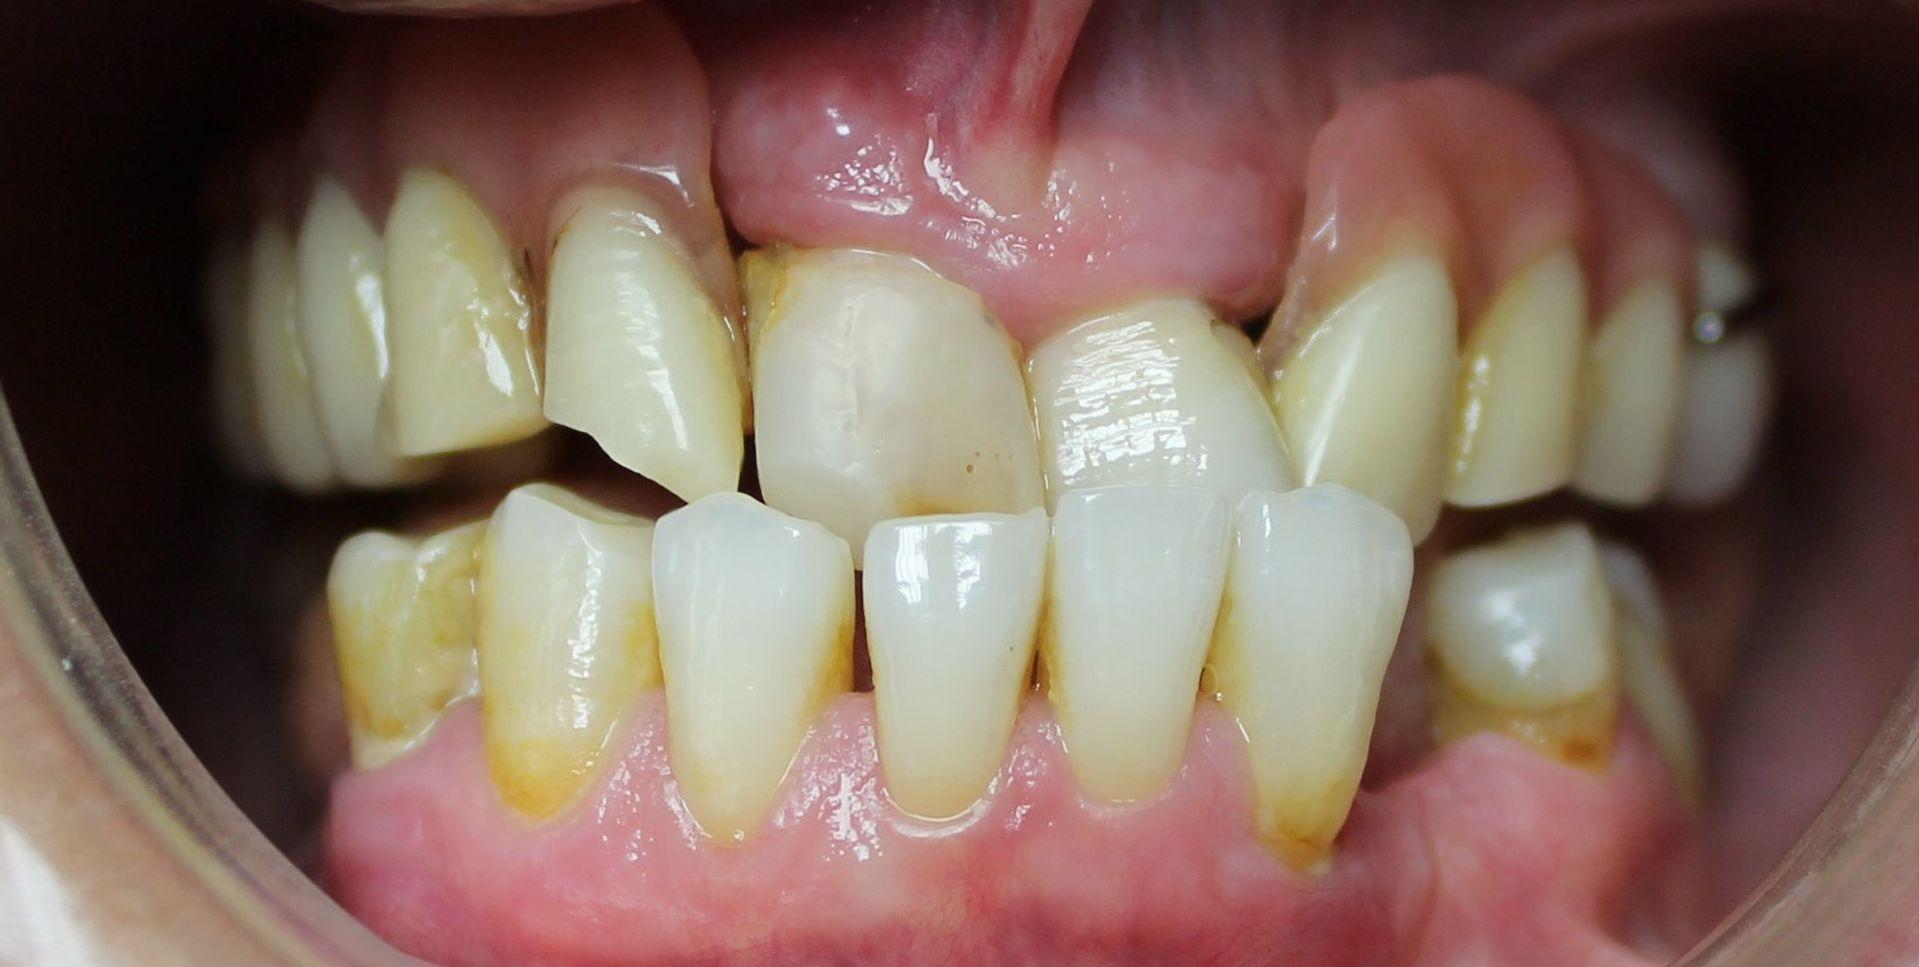 Foto 22 de Clínicas dentales en O Milladoiro | Clínica Implanteoral Milladoiro